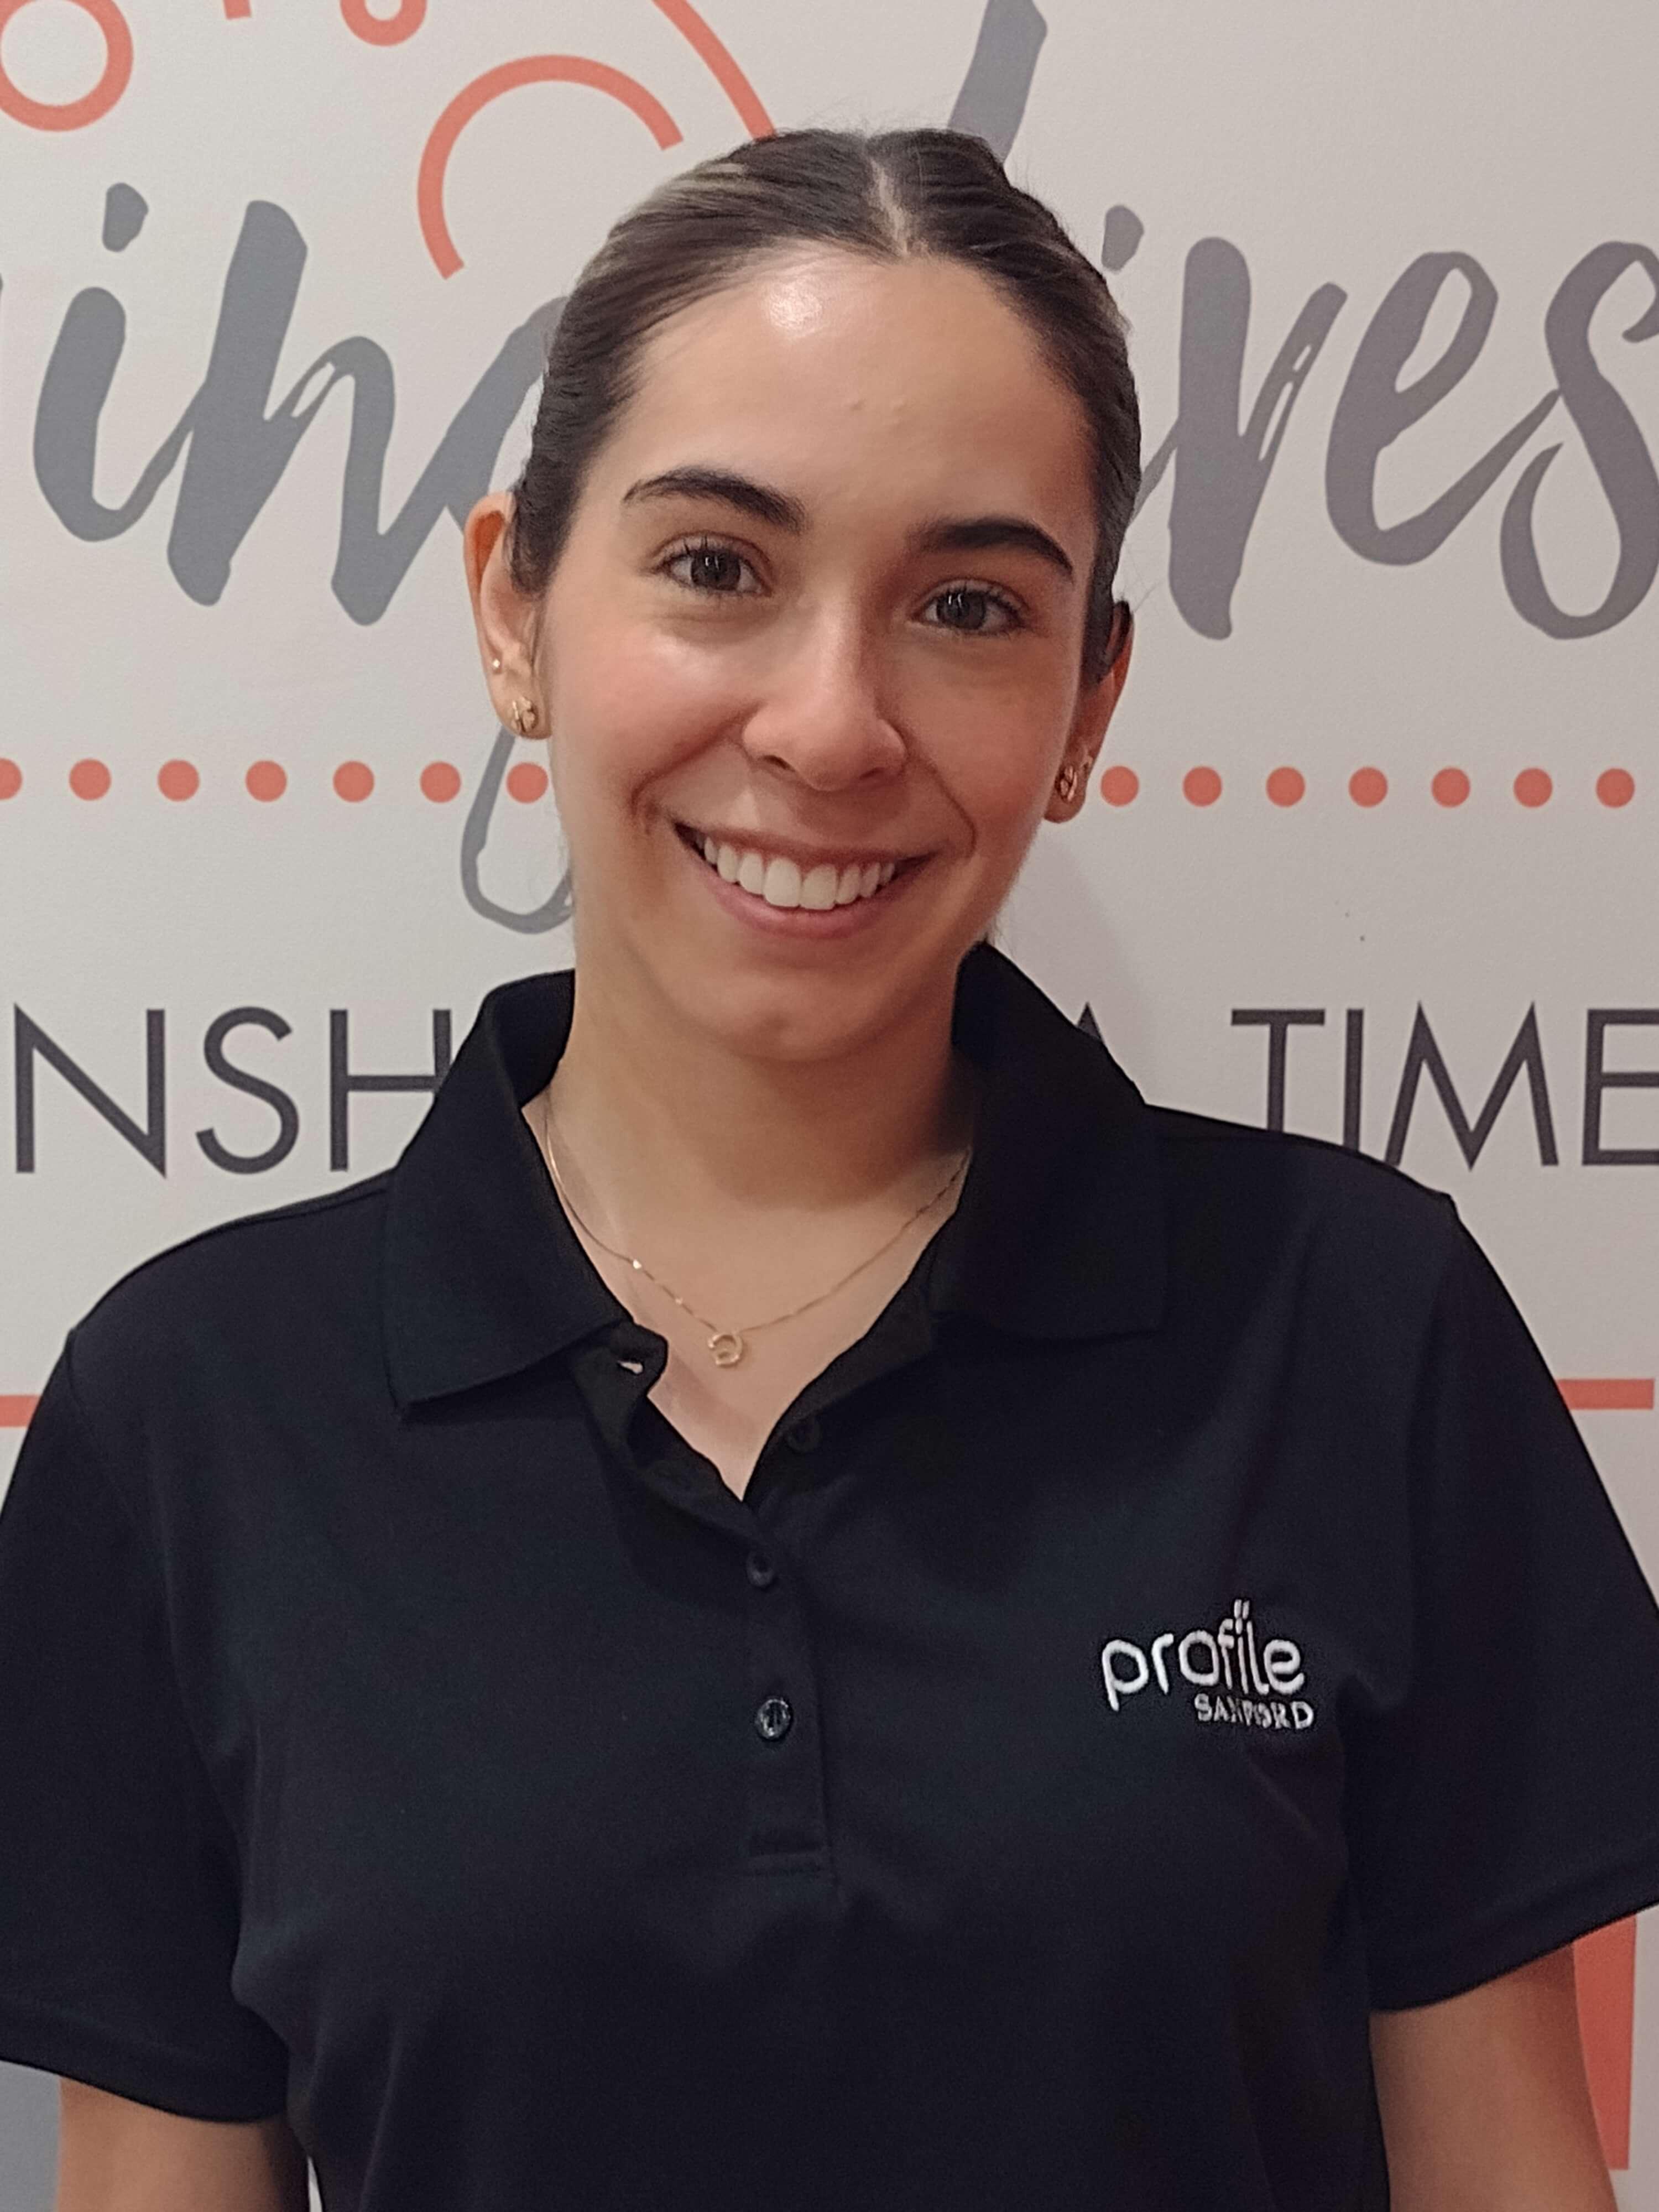 Gianella Diaz headshot - Profile by Sanford